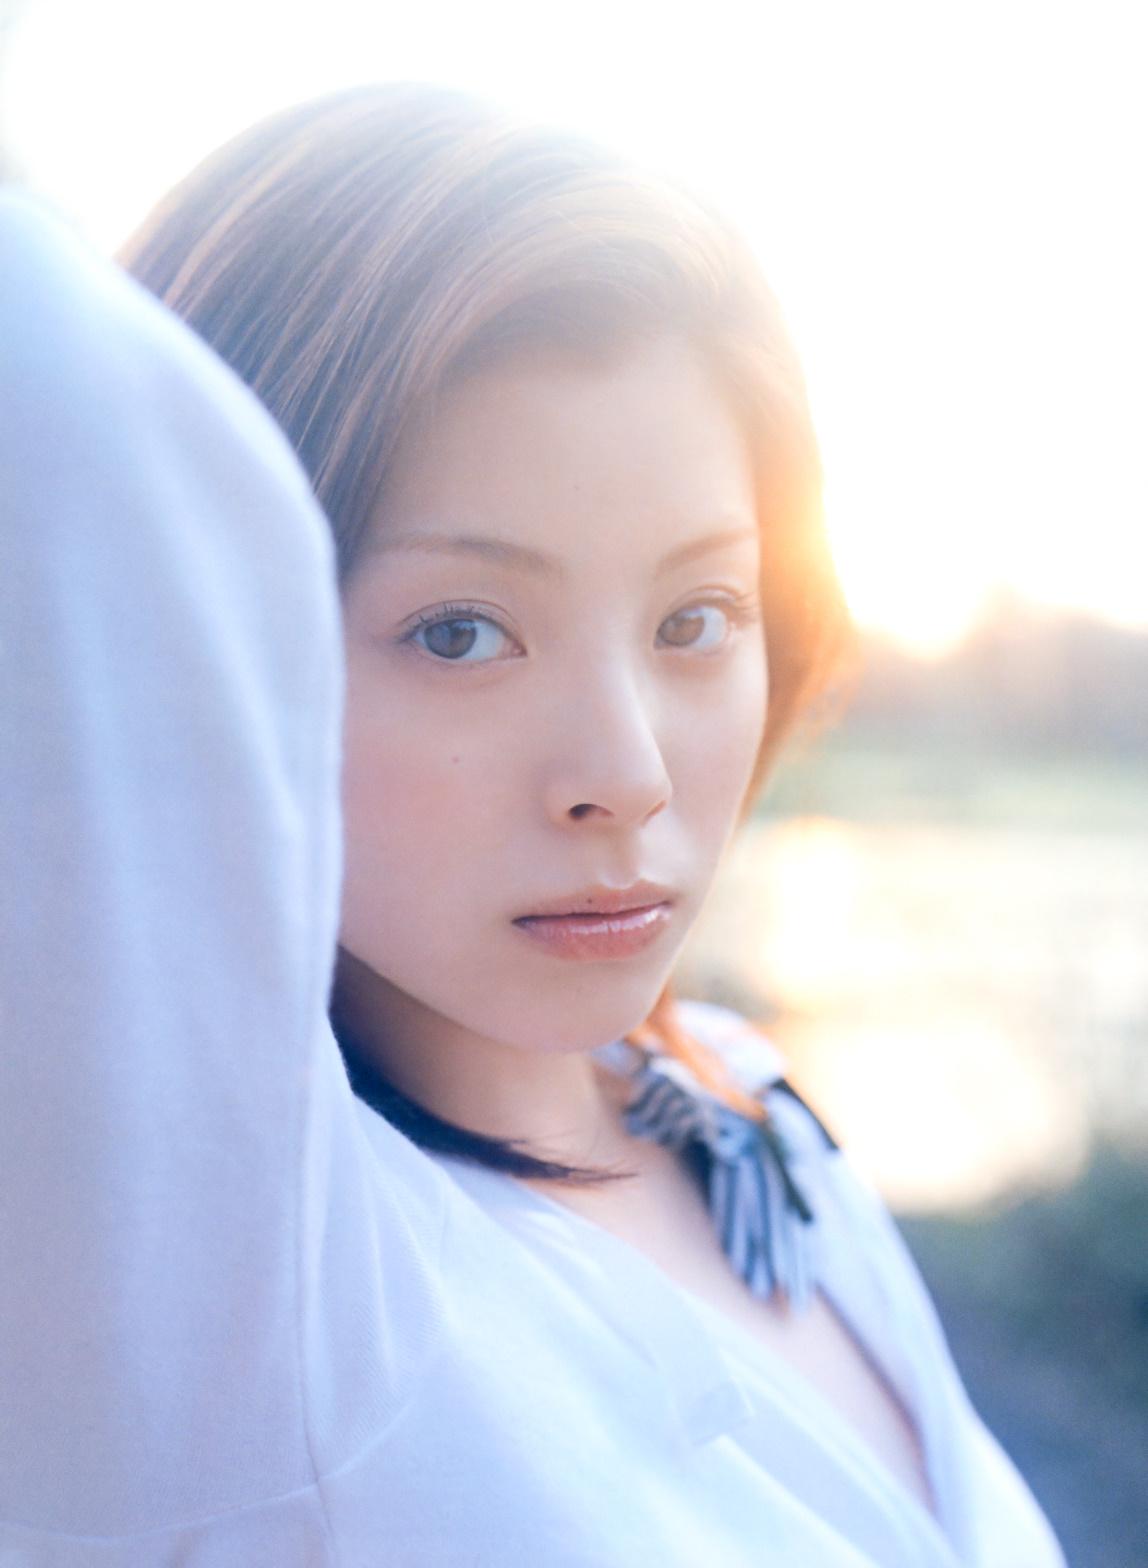 AyaMatsuura-A_PH5-75.jpg